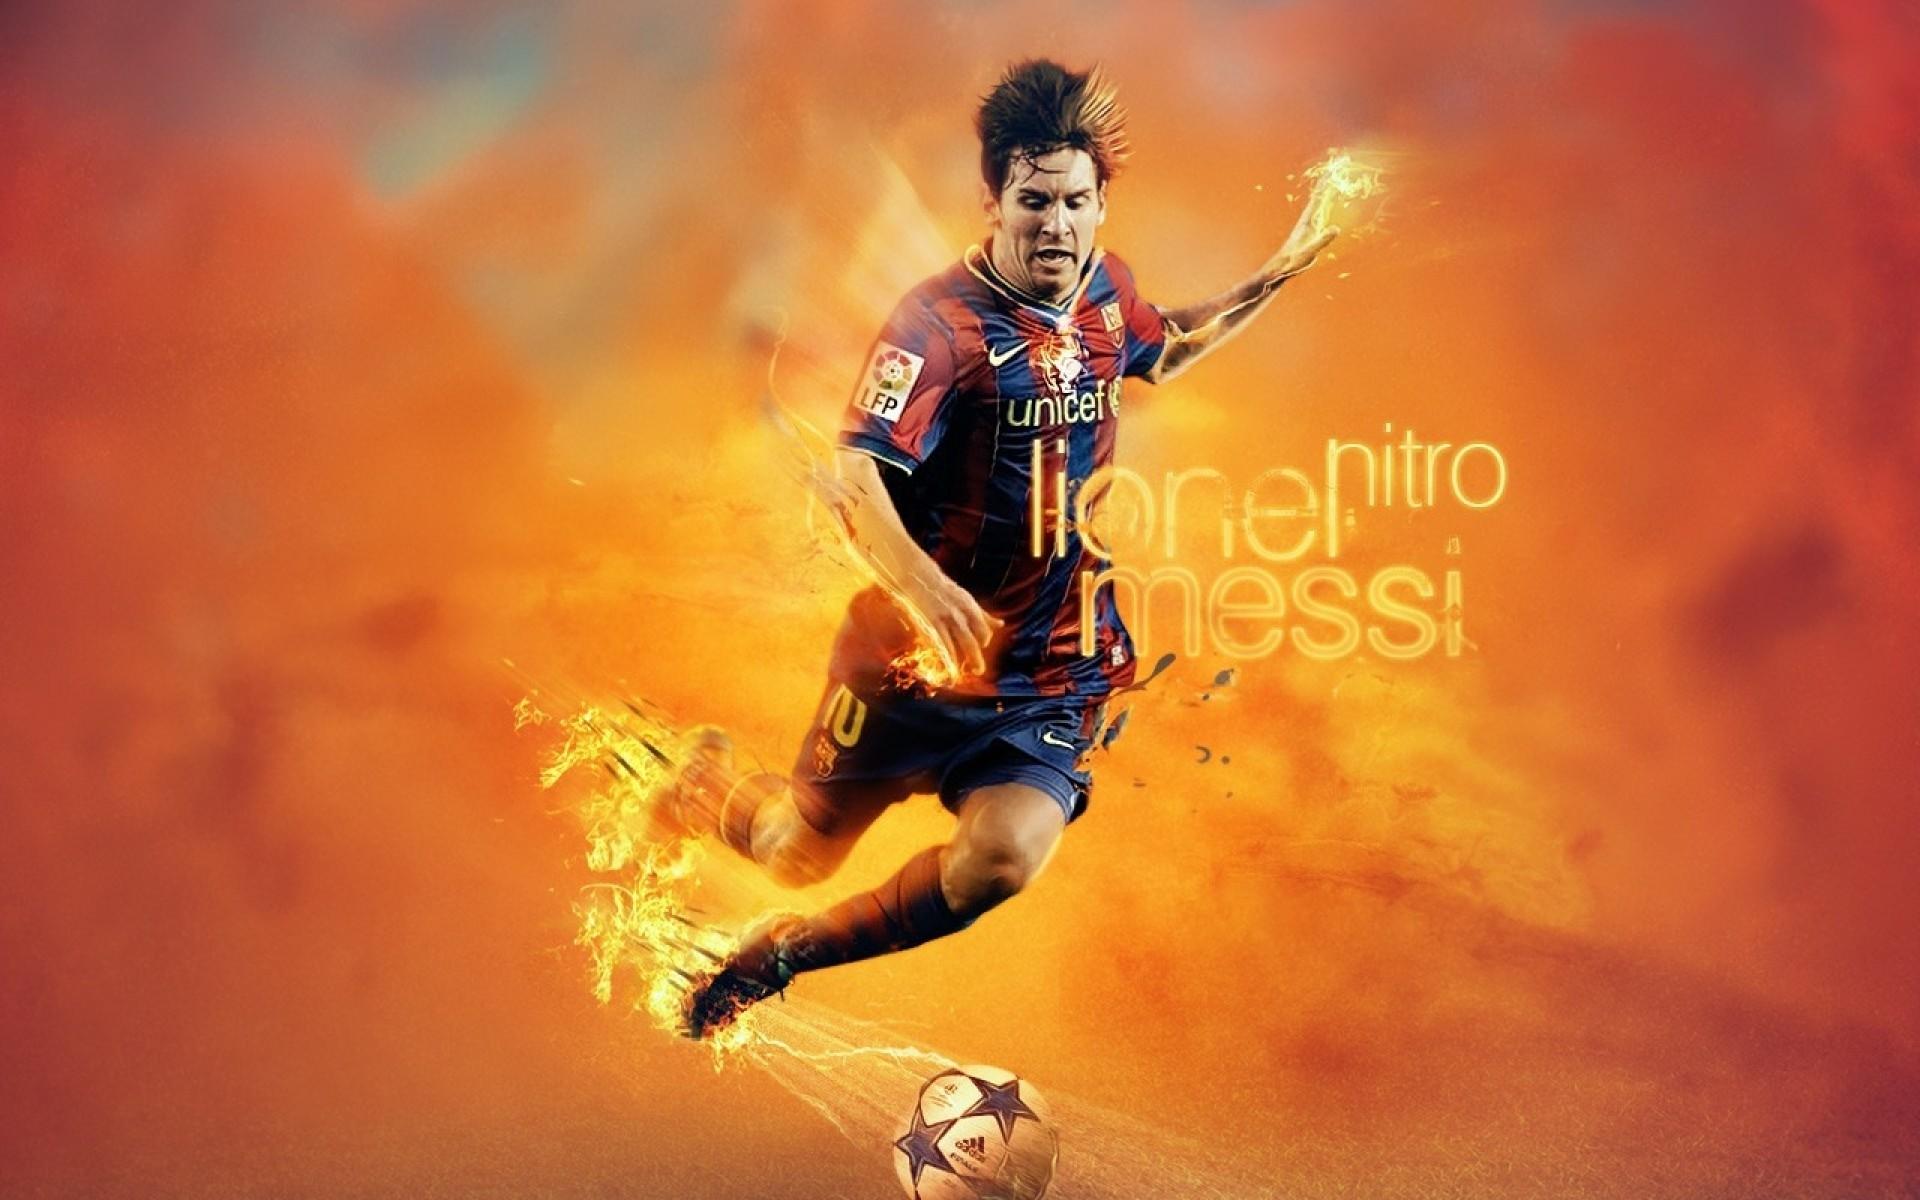 Res: 1920x1200, football background wallpaper - Messi 10 soccer player football wallpaper